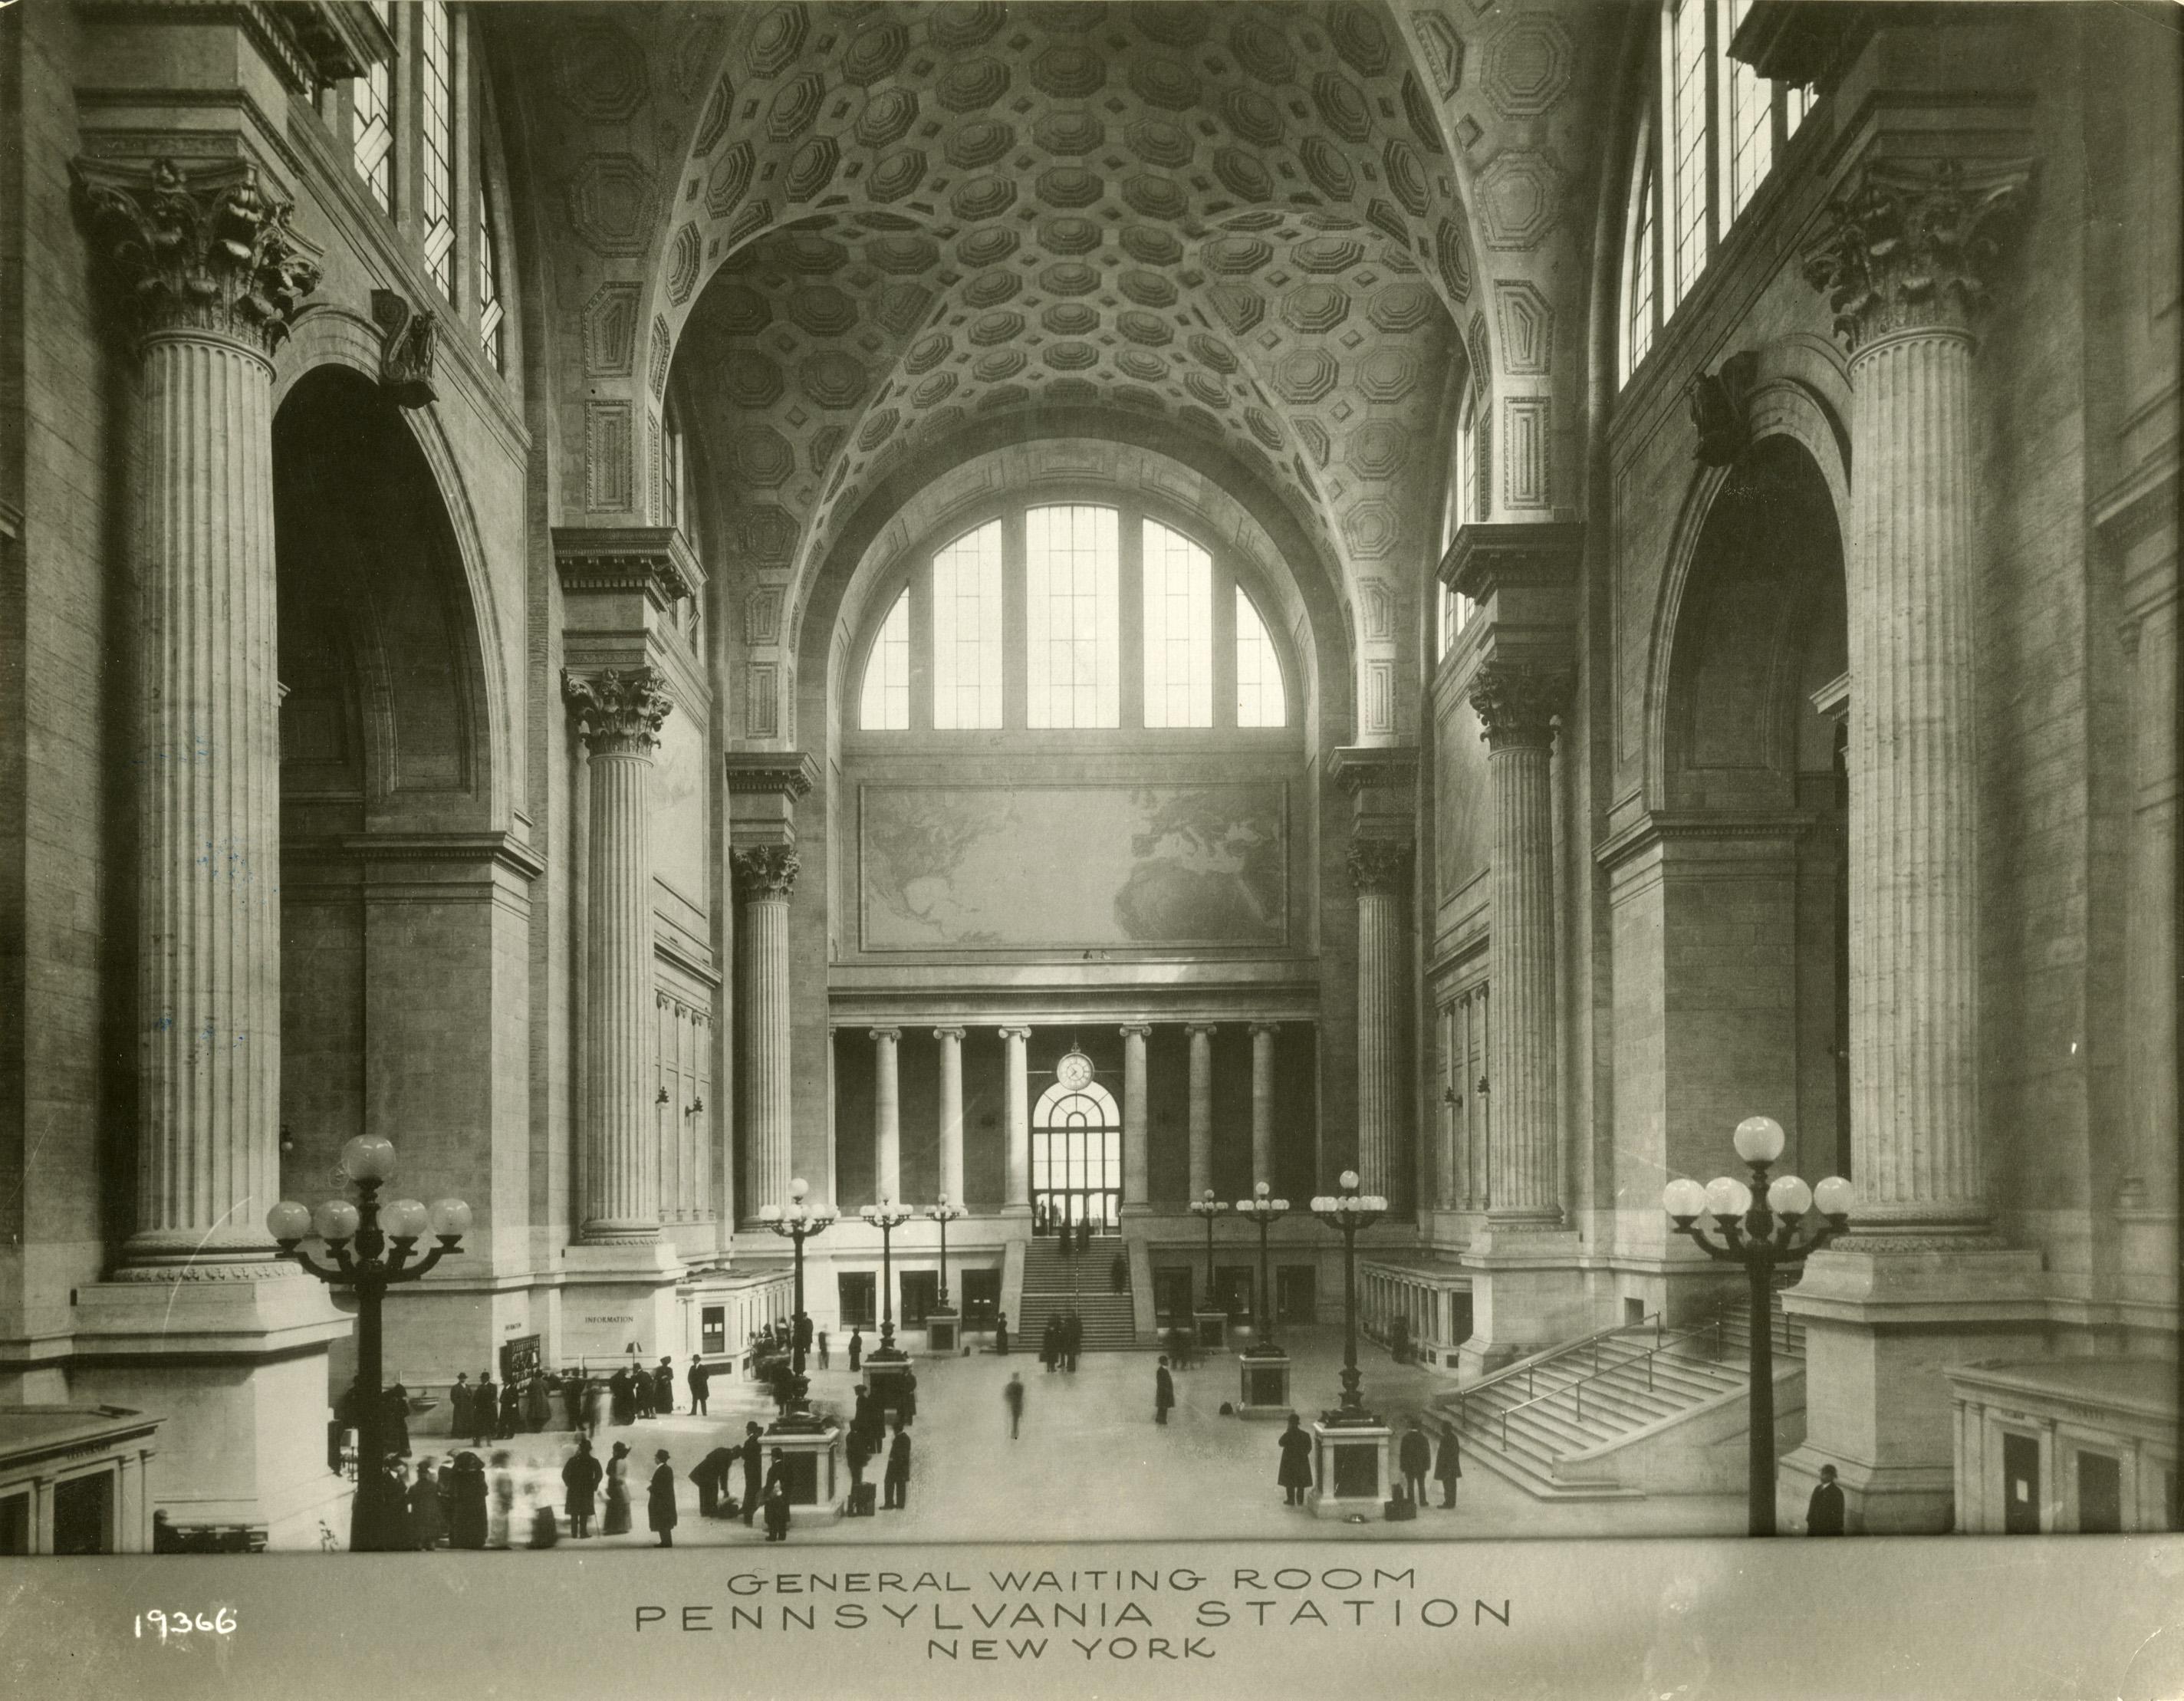 The Original Penn Station New York City